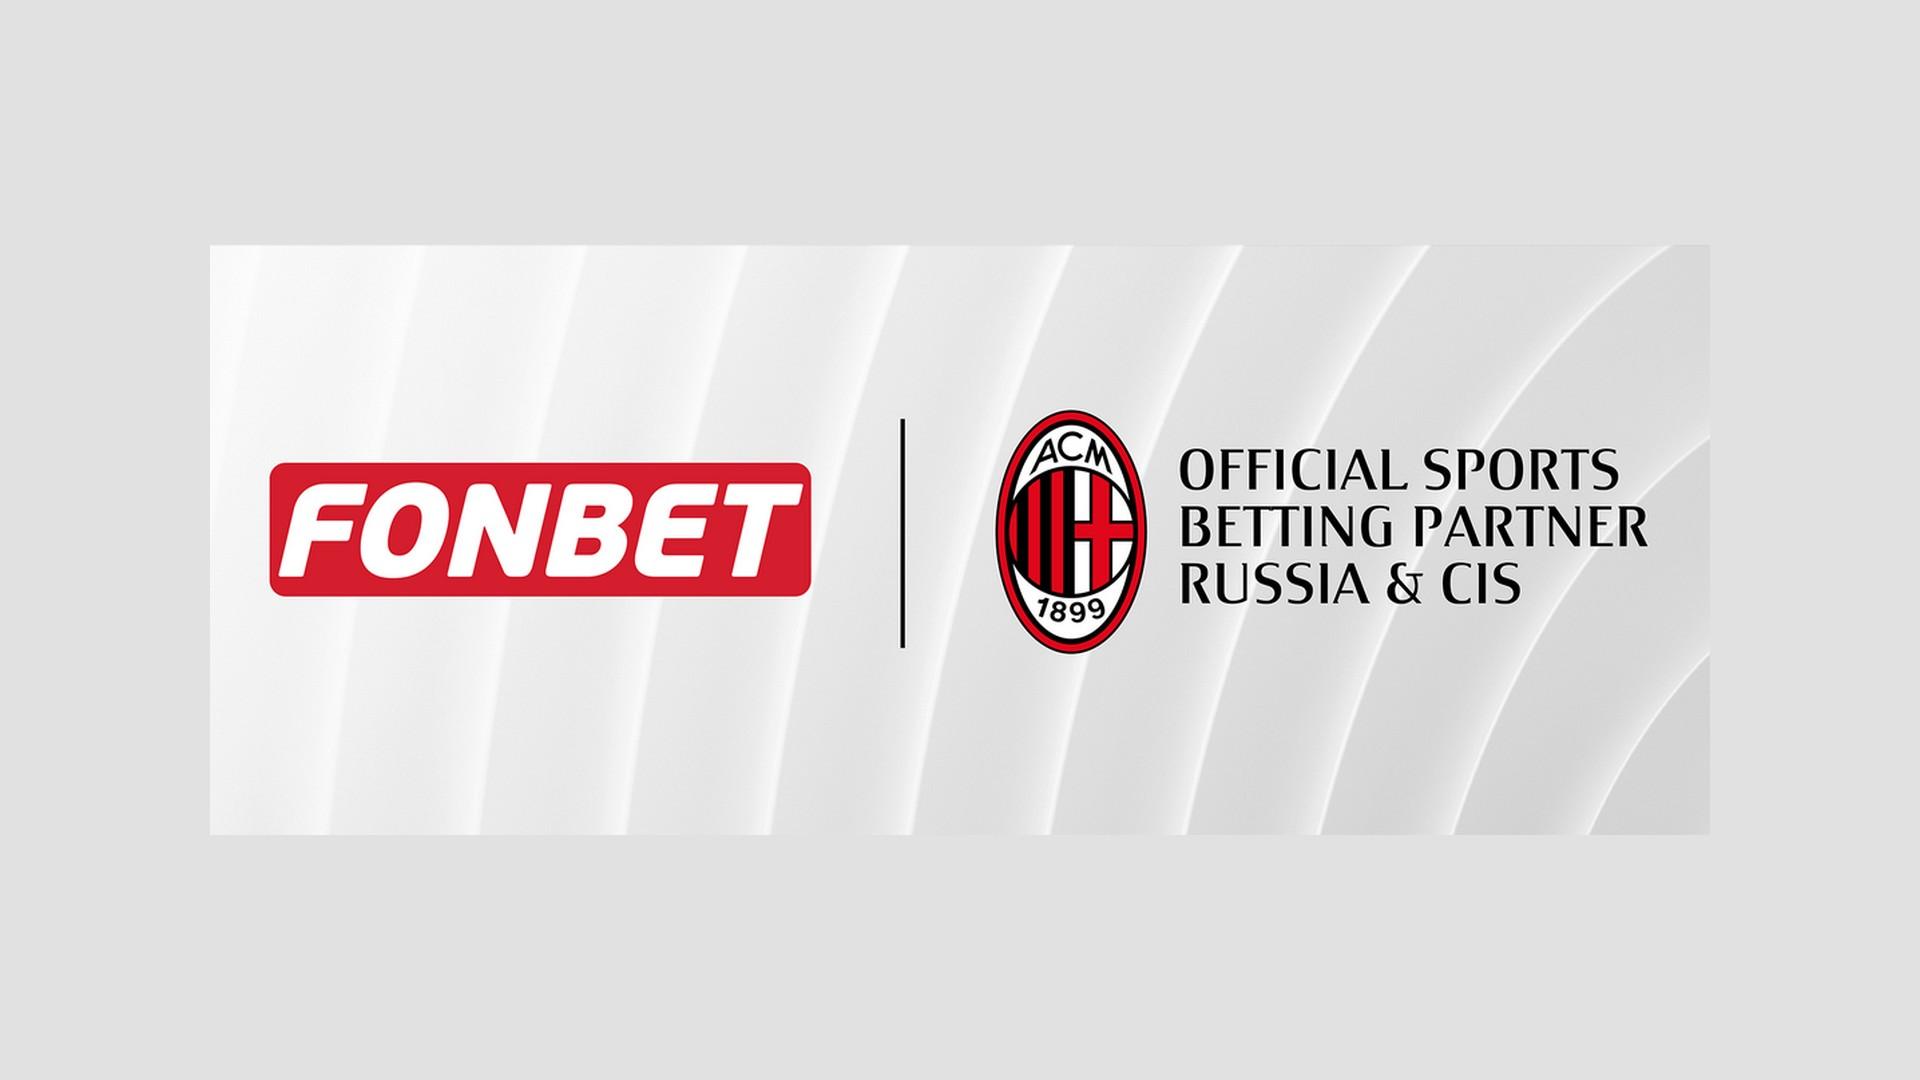 Fonbet x Milan AC (football) 2021